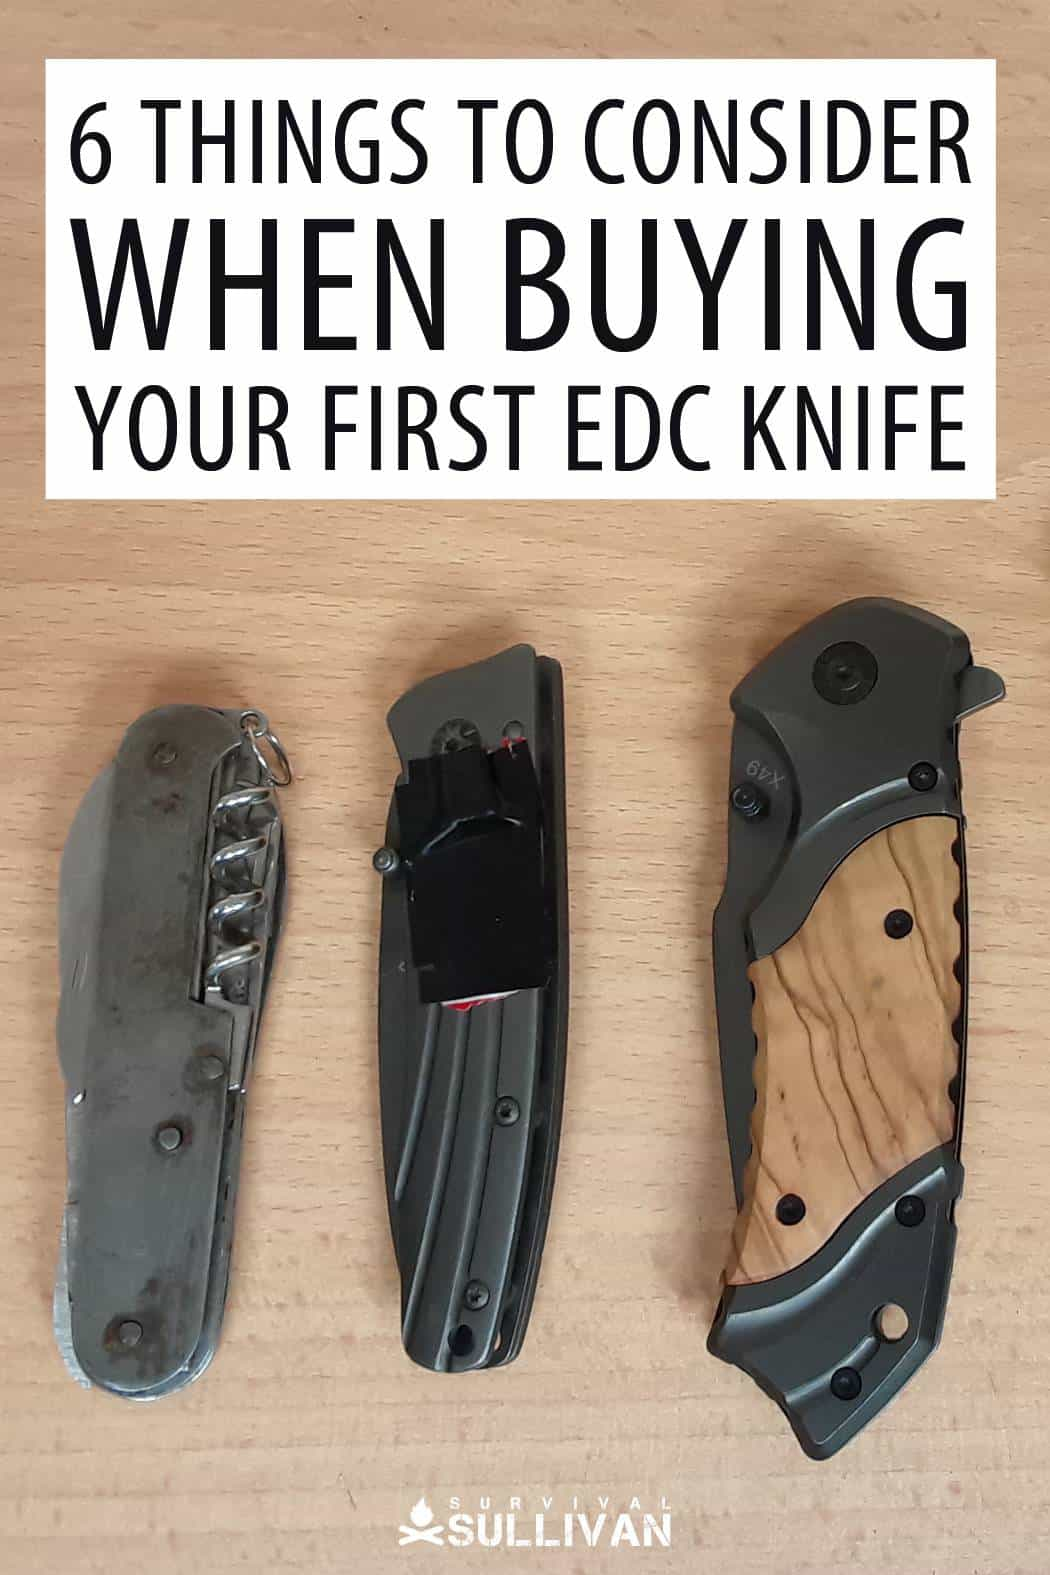 picking edc knives pinterest image